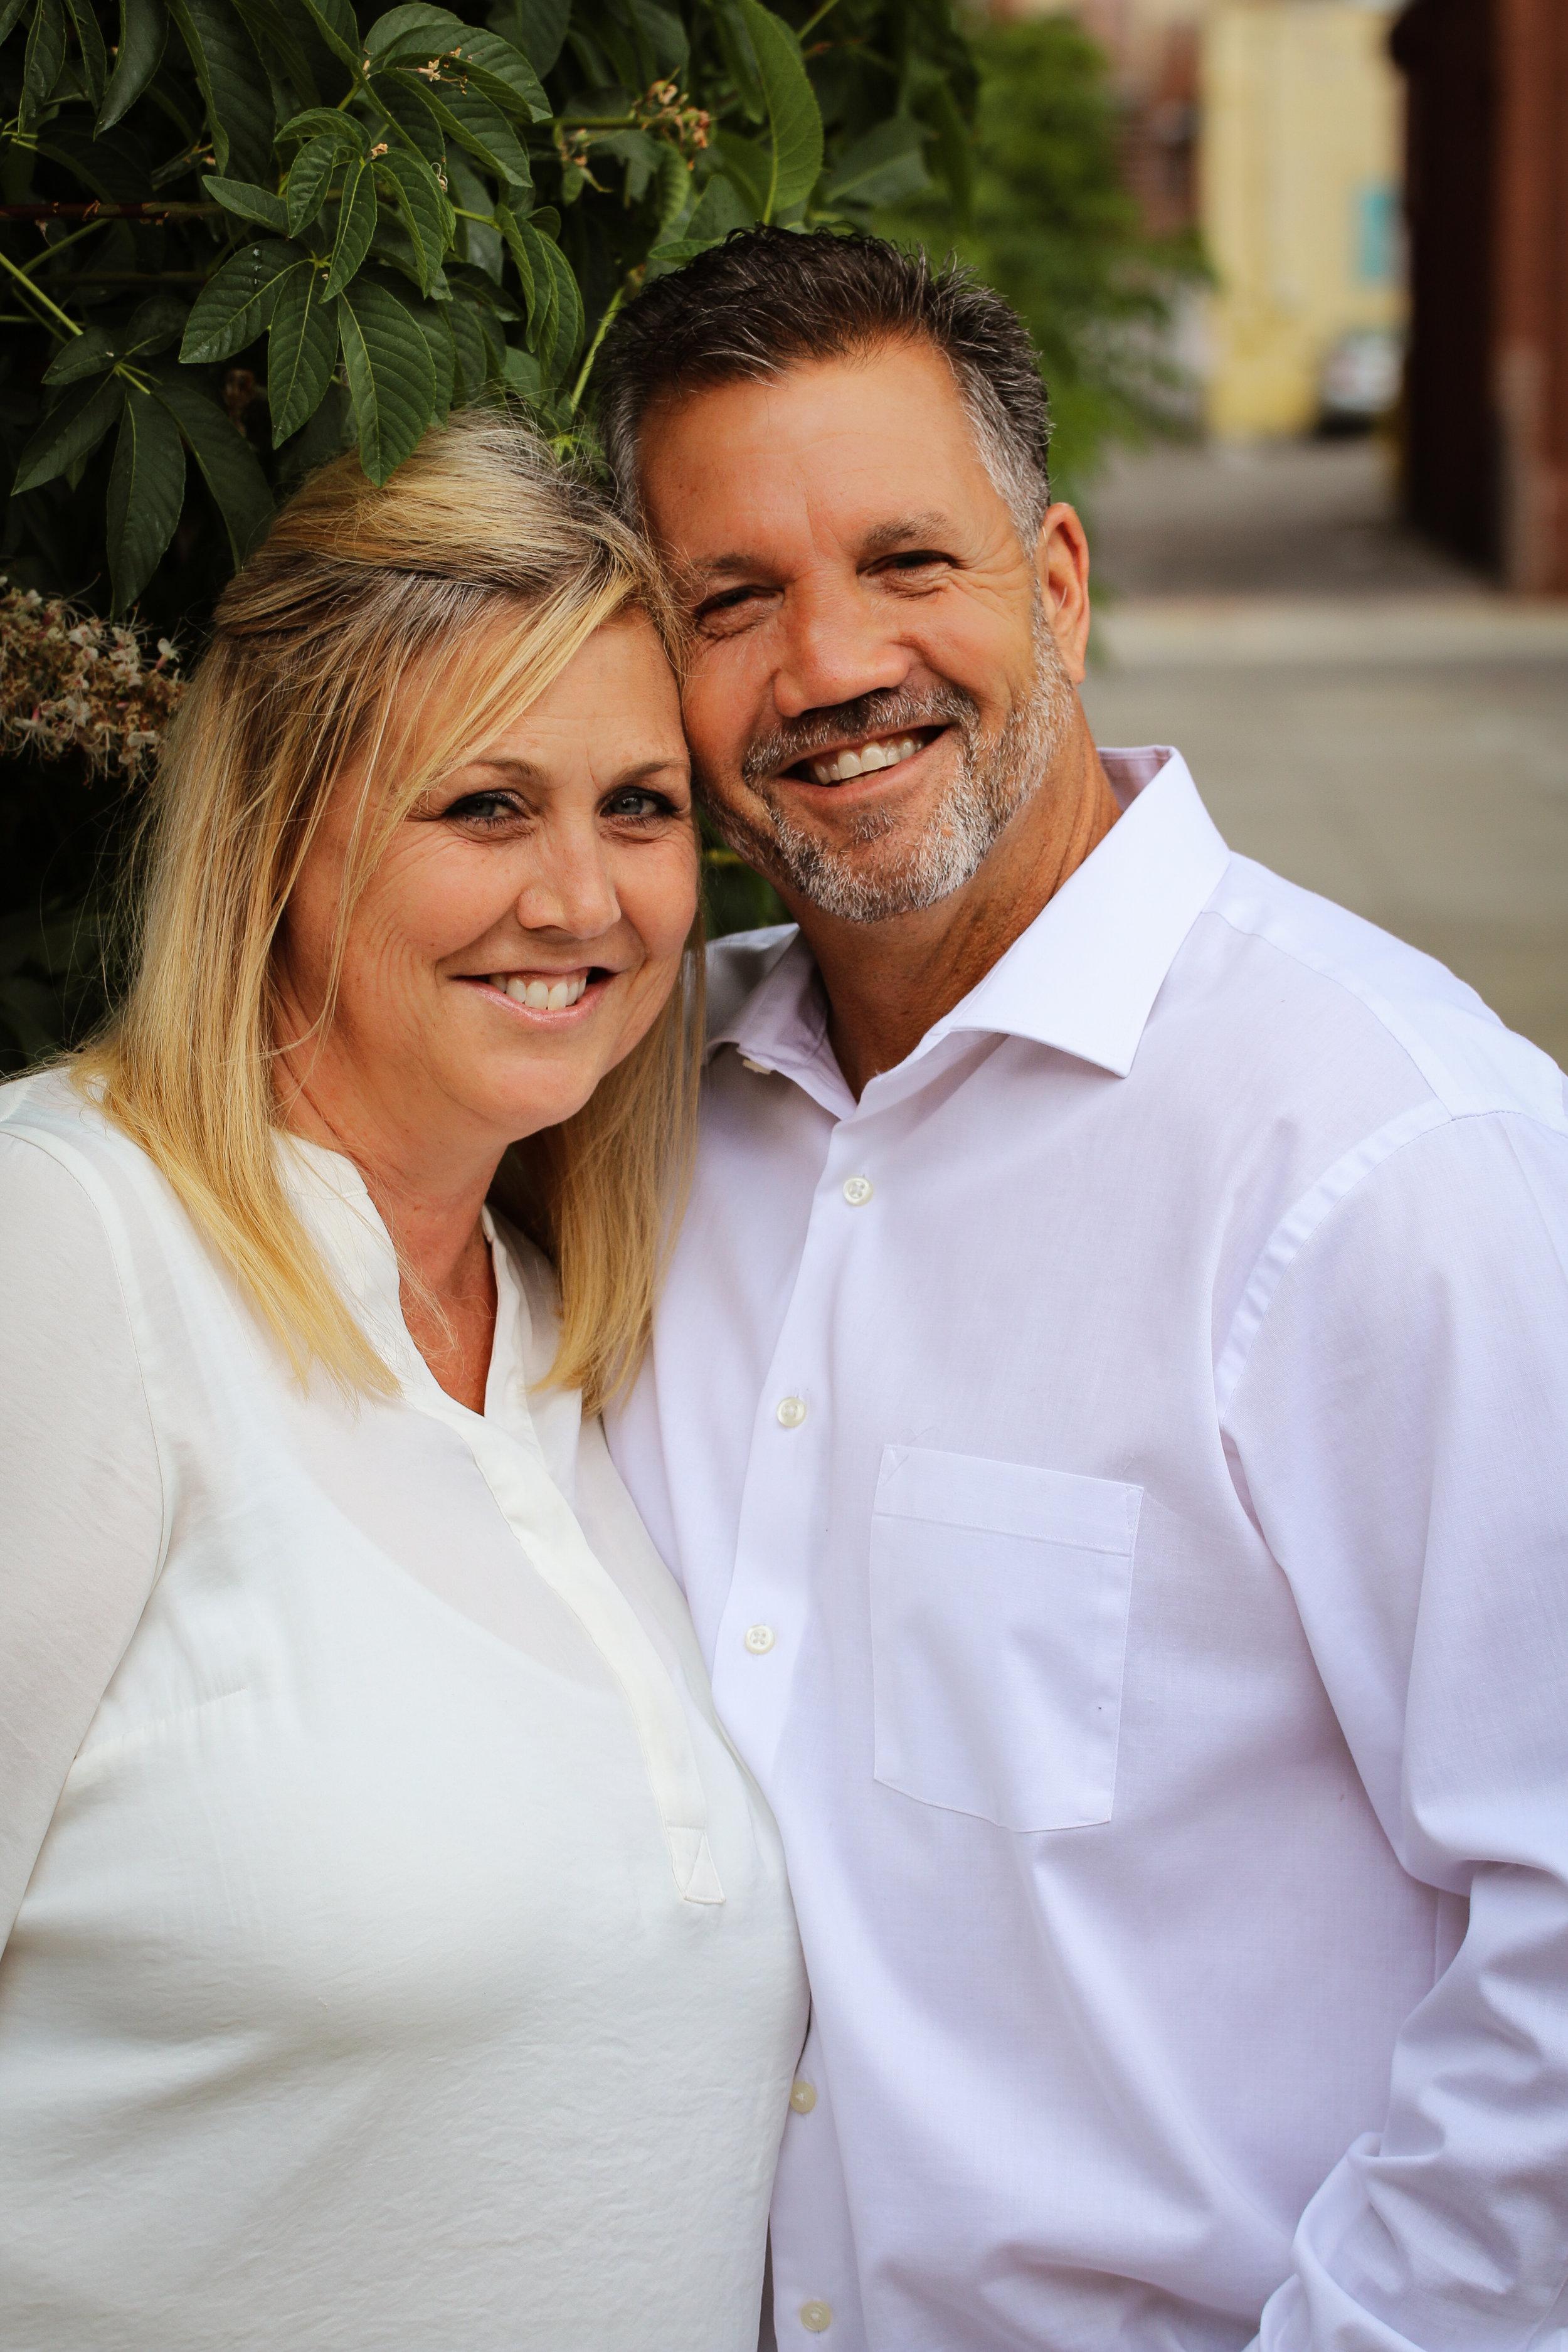 Jeff & Ronda Peters - HOSPITALITY